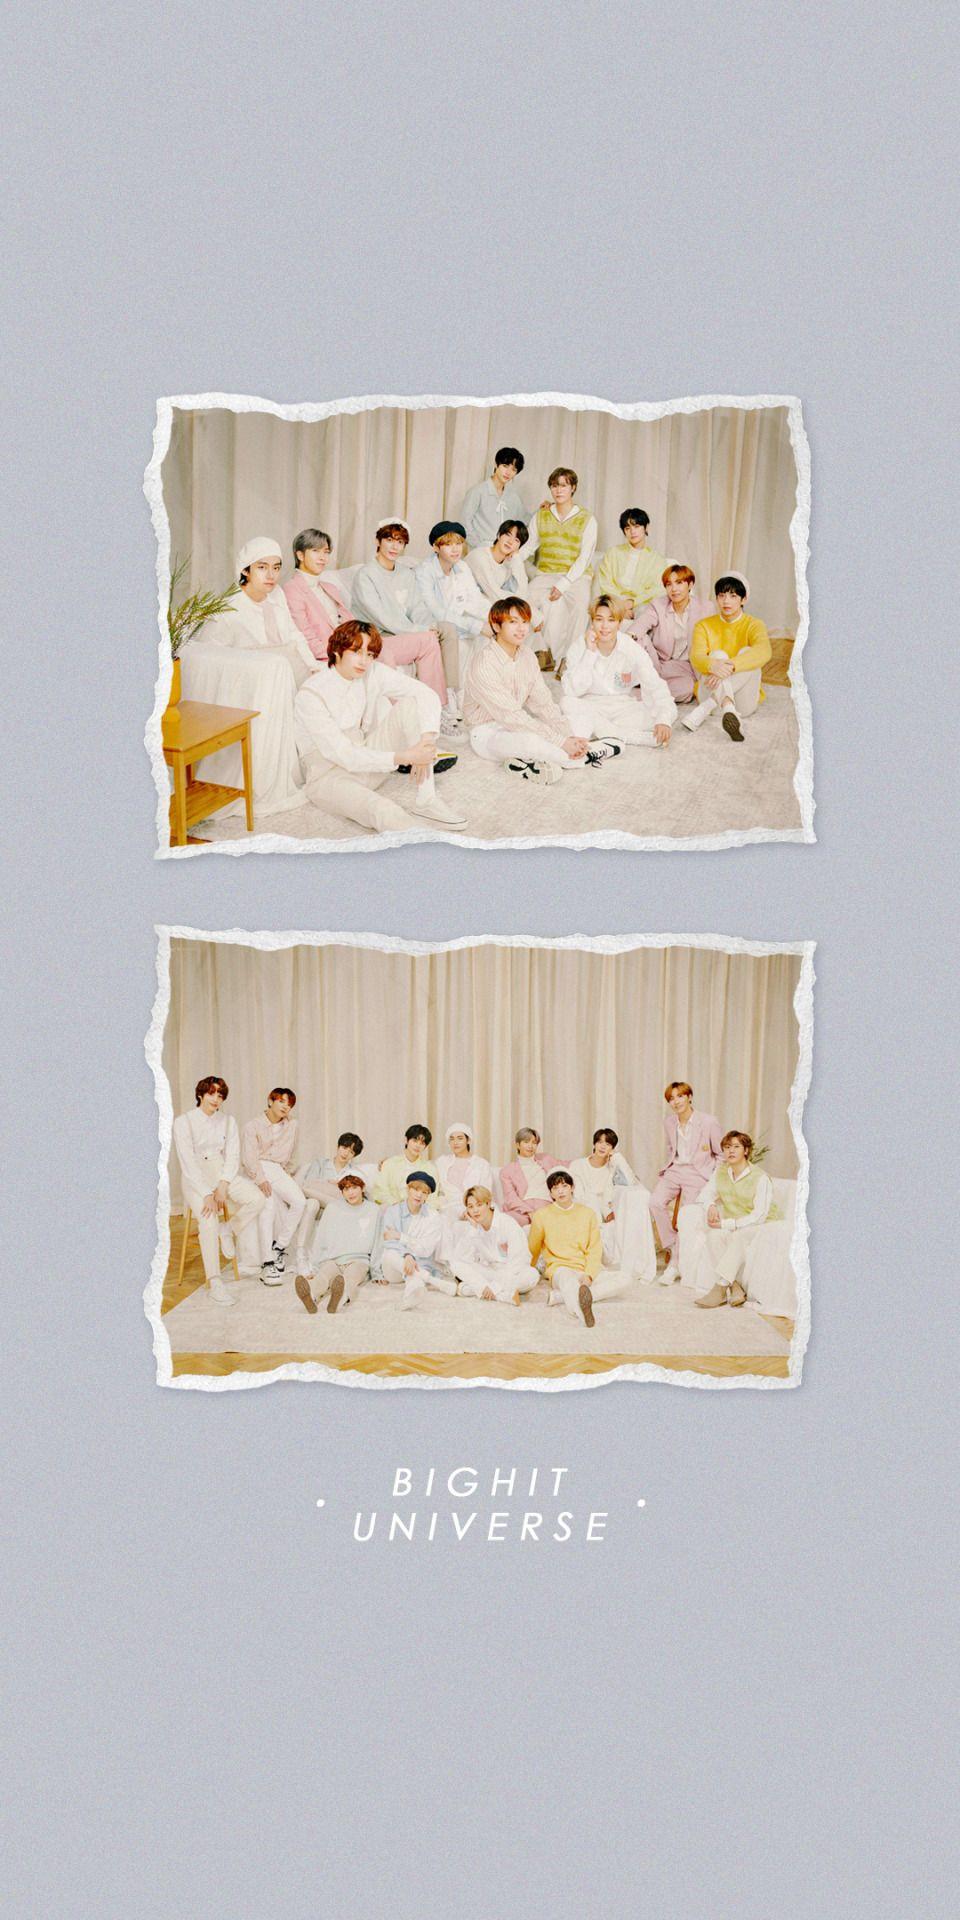 insaneon in 2020 Kpop wallpaper, Bts wallpaper